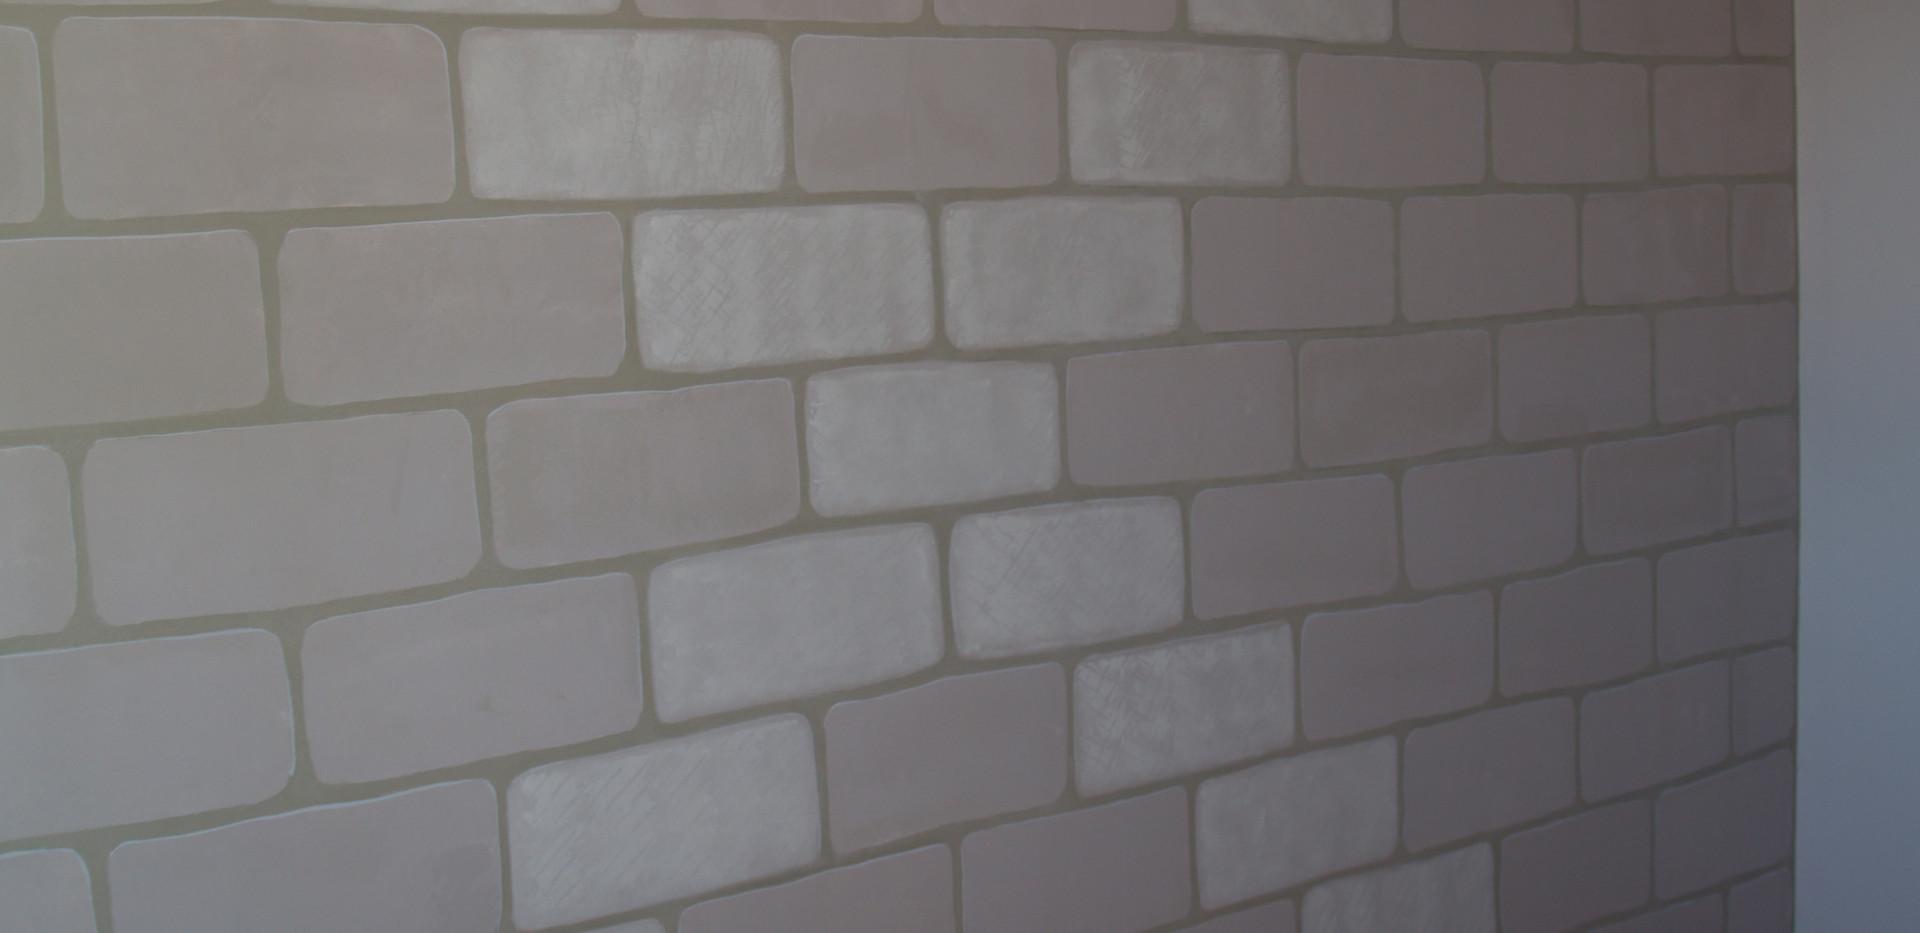 feature-wall2.JPG